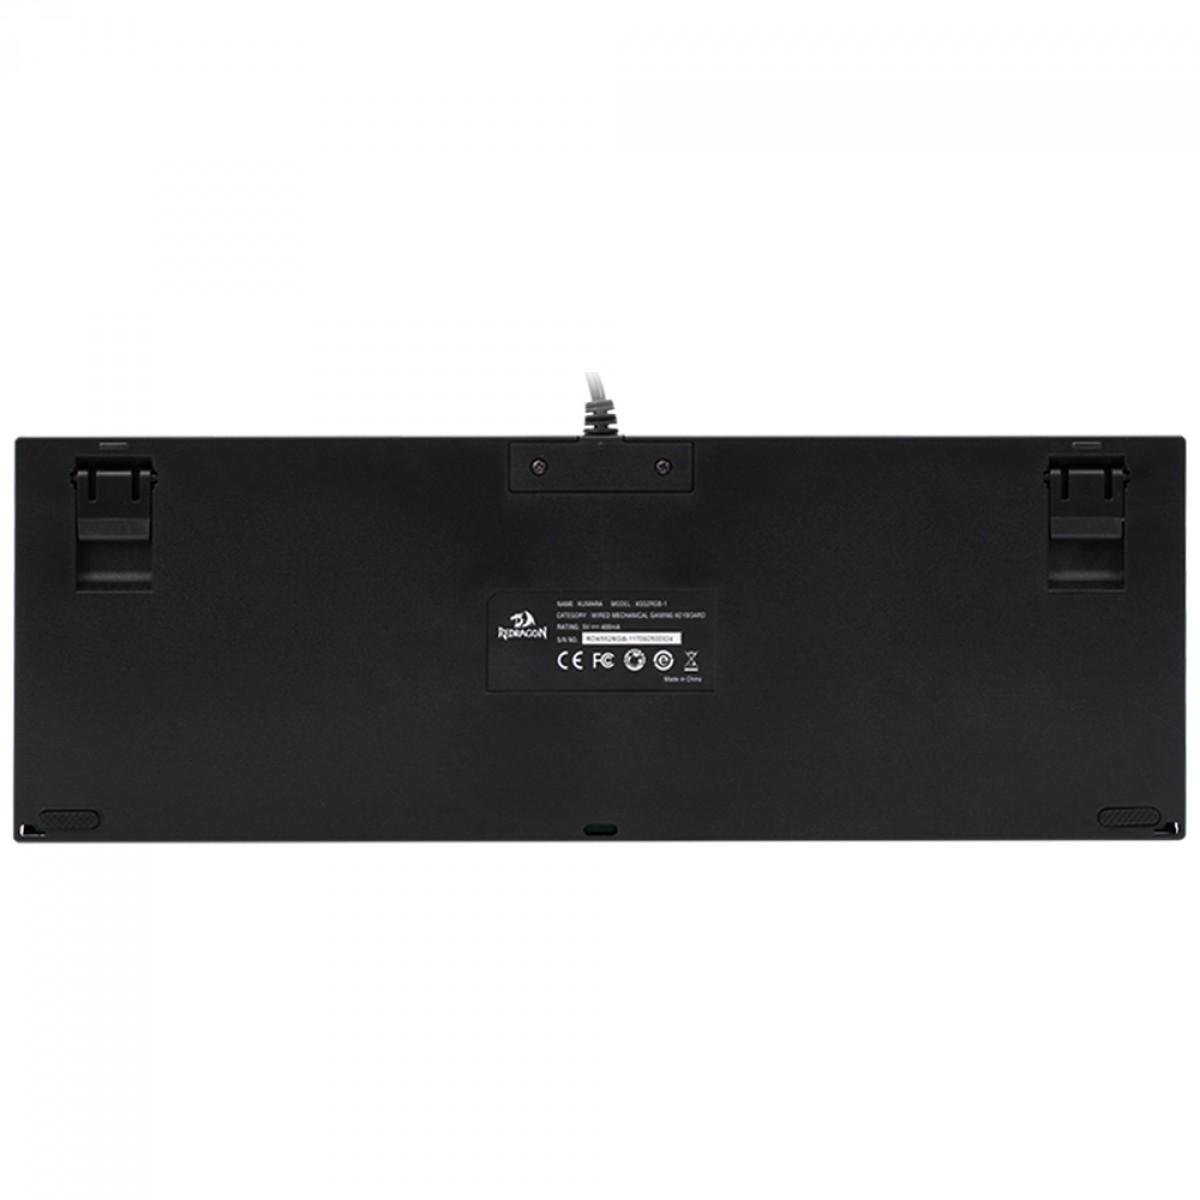 Teclado Mecânico Gamer Redragon Kumara K552 RGB, Switch Brown, ABNT2, Black, K552RGB-1-PTBROWN